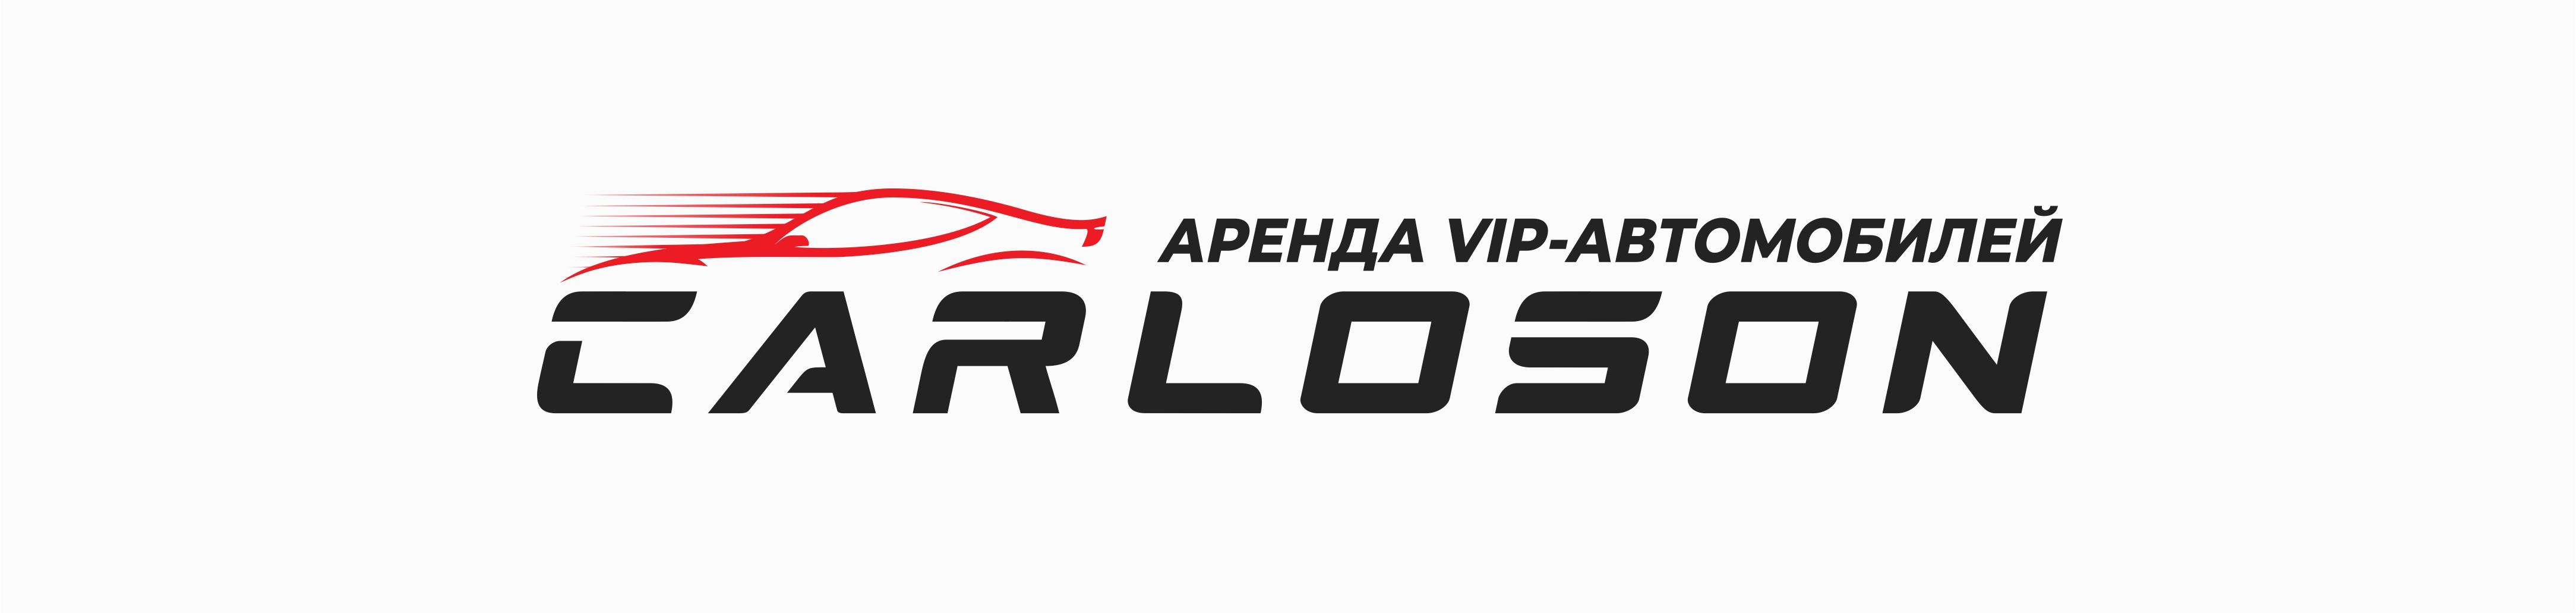 Логотип для компании по прокату  VIP автомобилей фото f_6755adcceda667f2.jpg